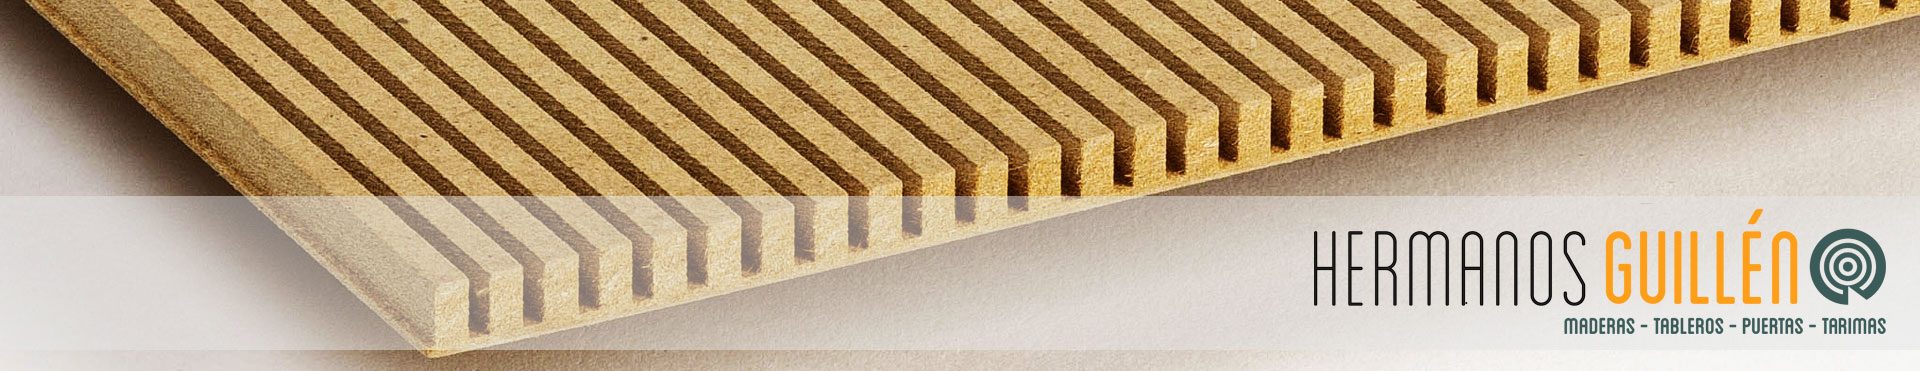 Fibraform MDF DM flexible y curvable